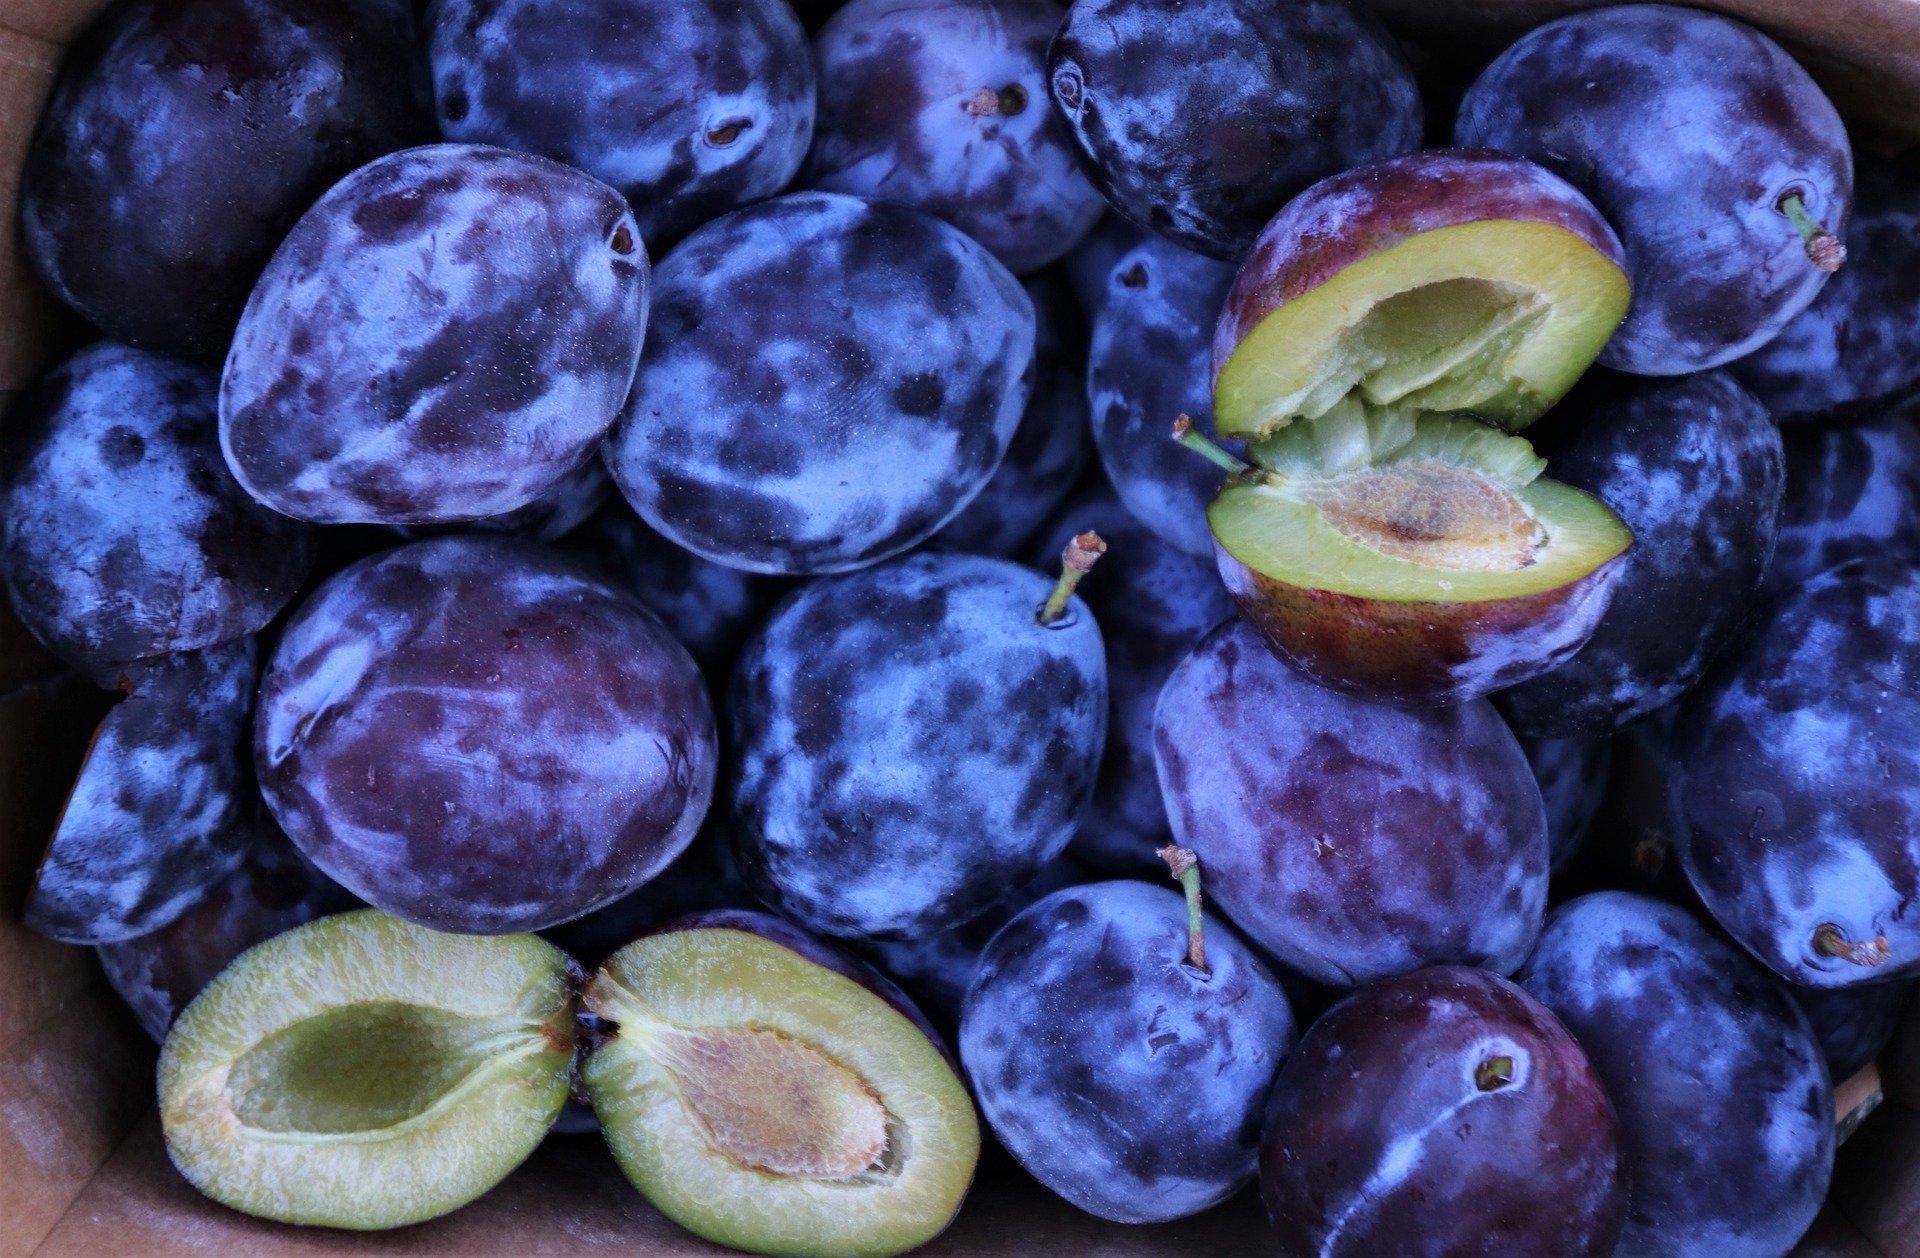 fruit-5426690_1920